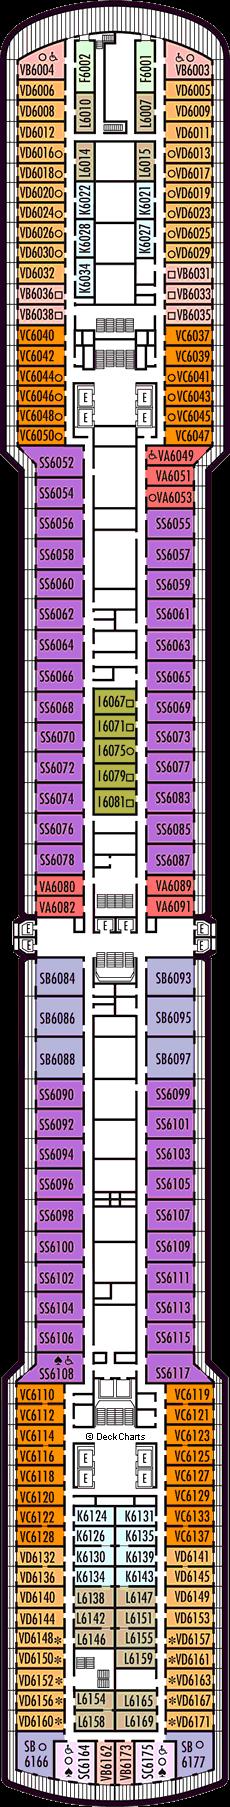 Noordam: Upper Verandah Deck